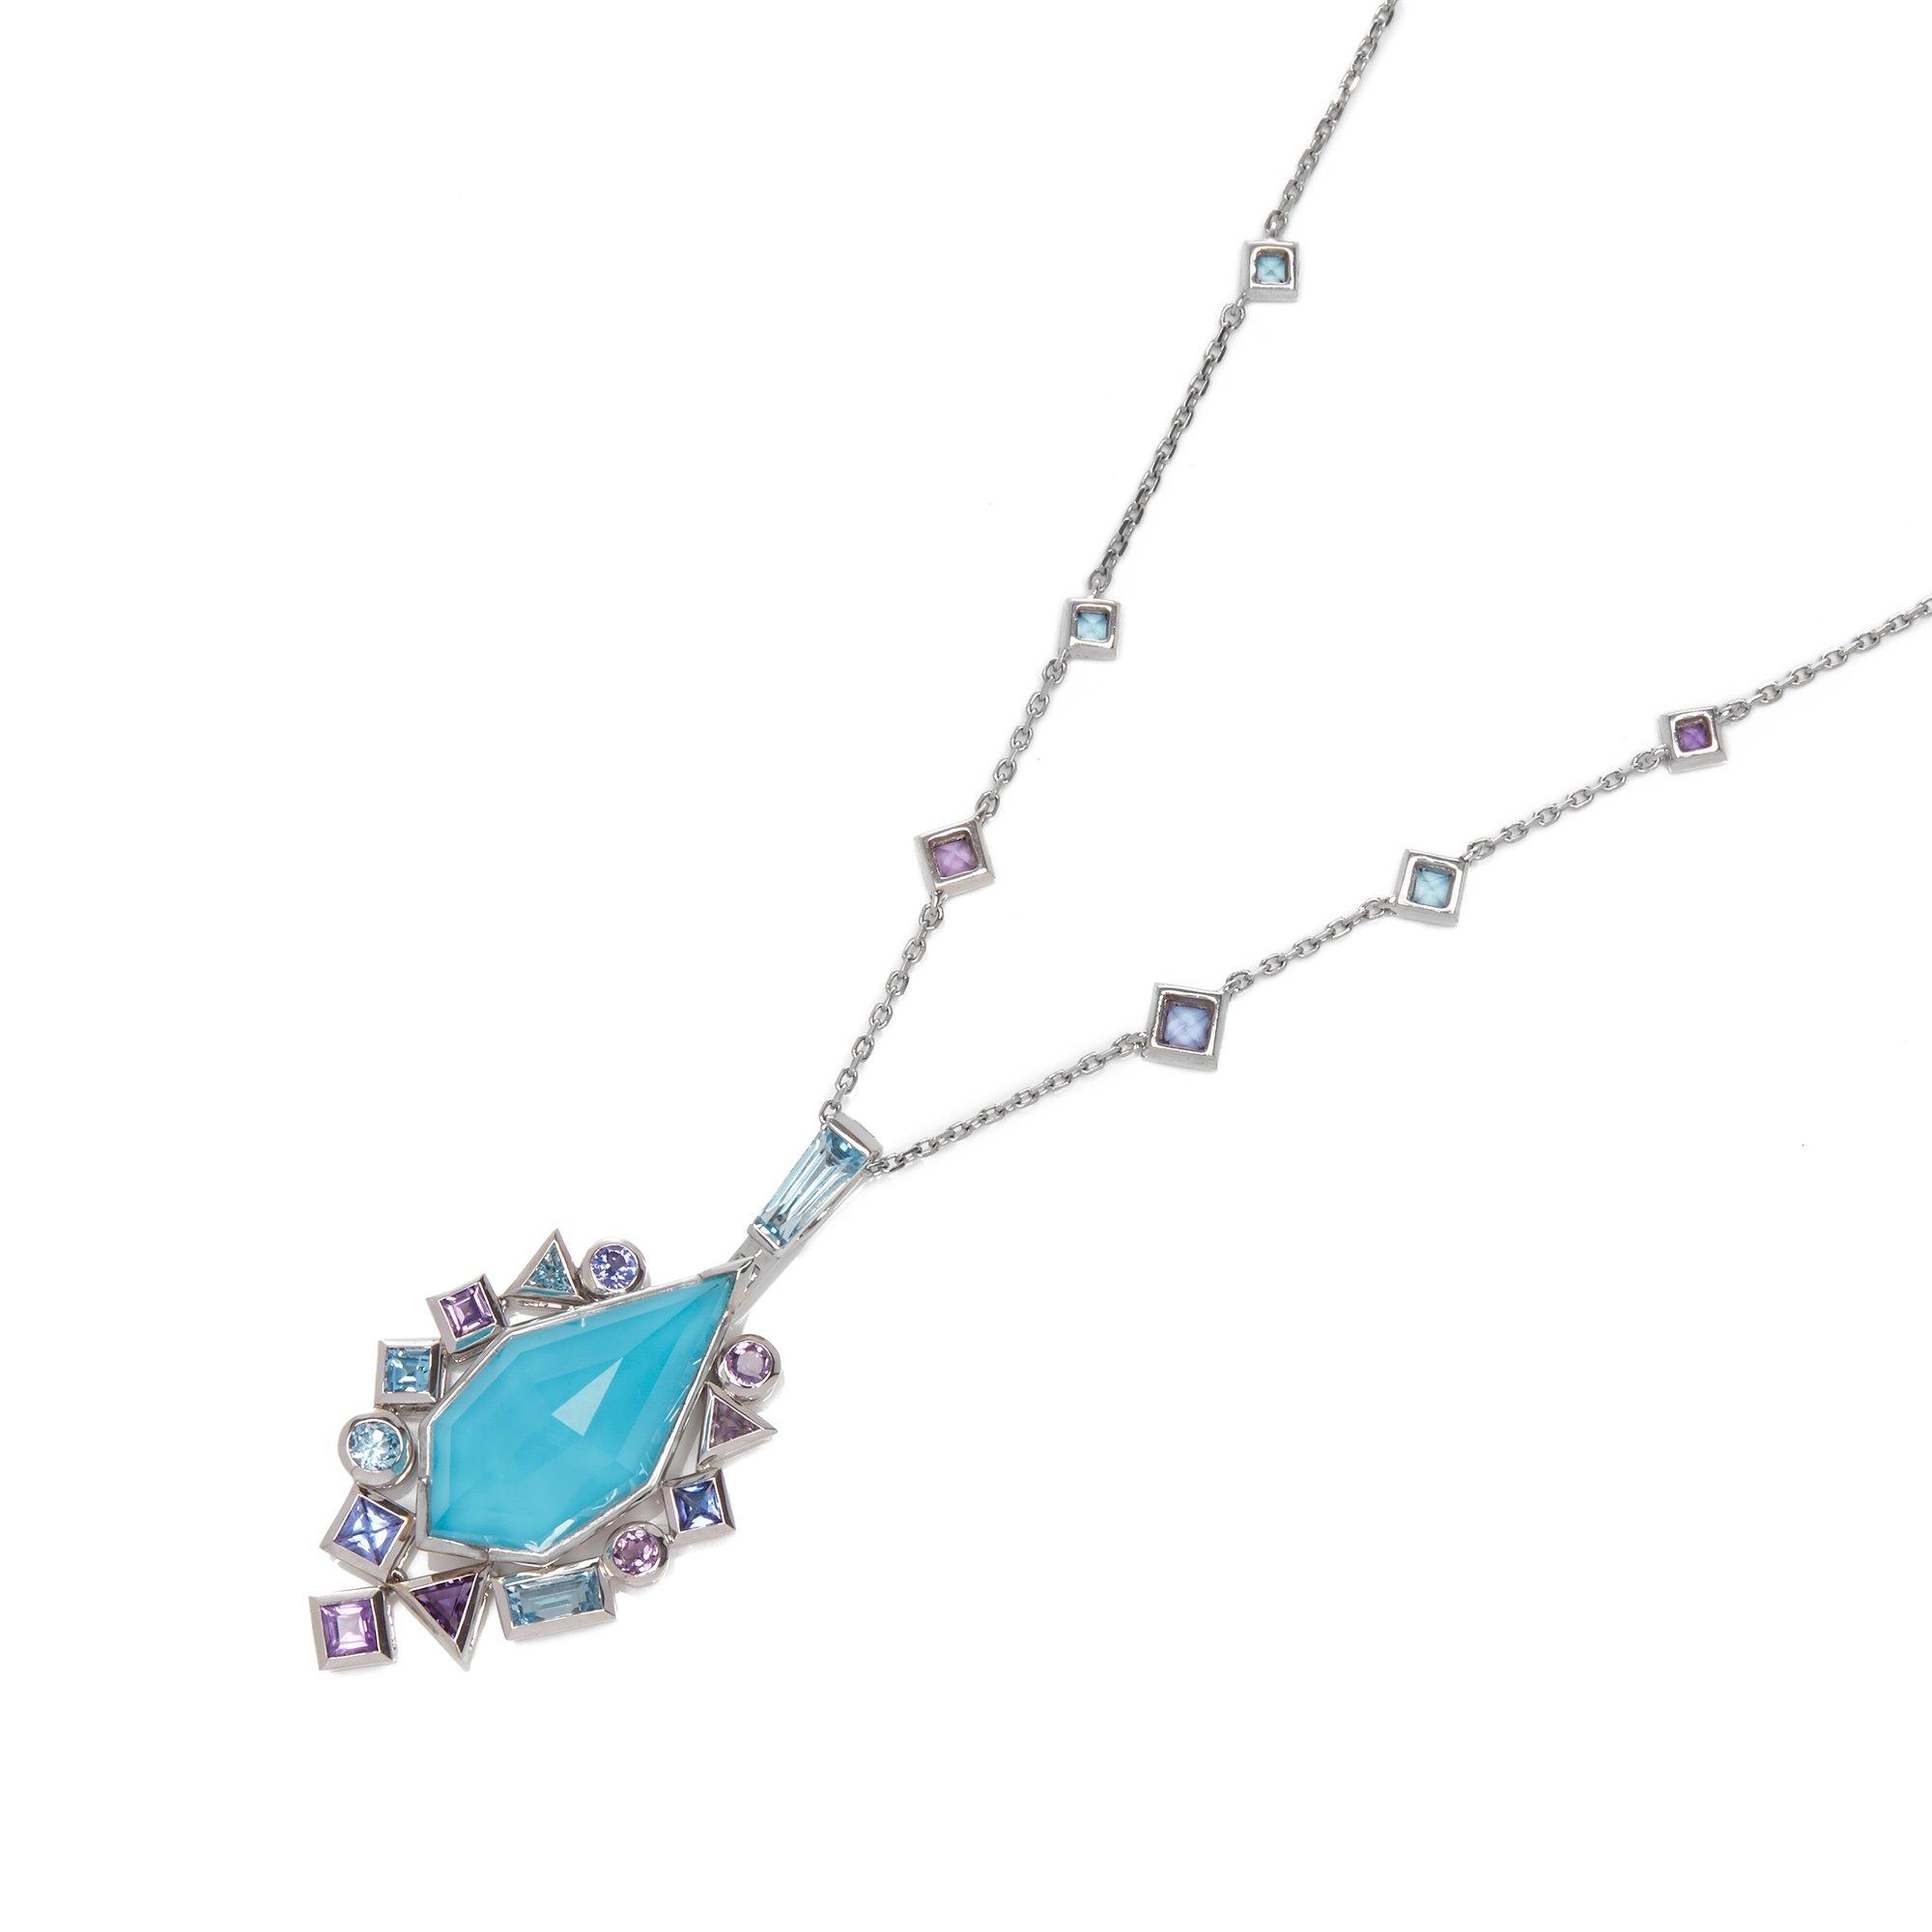 Stephen Webster Crystal haze 18ct White Gold Gold Struck Turquoise Pendant